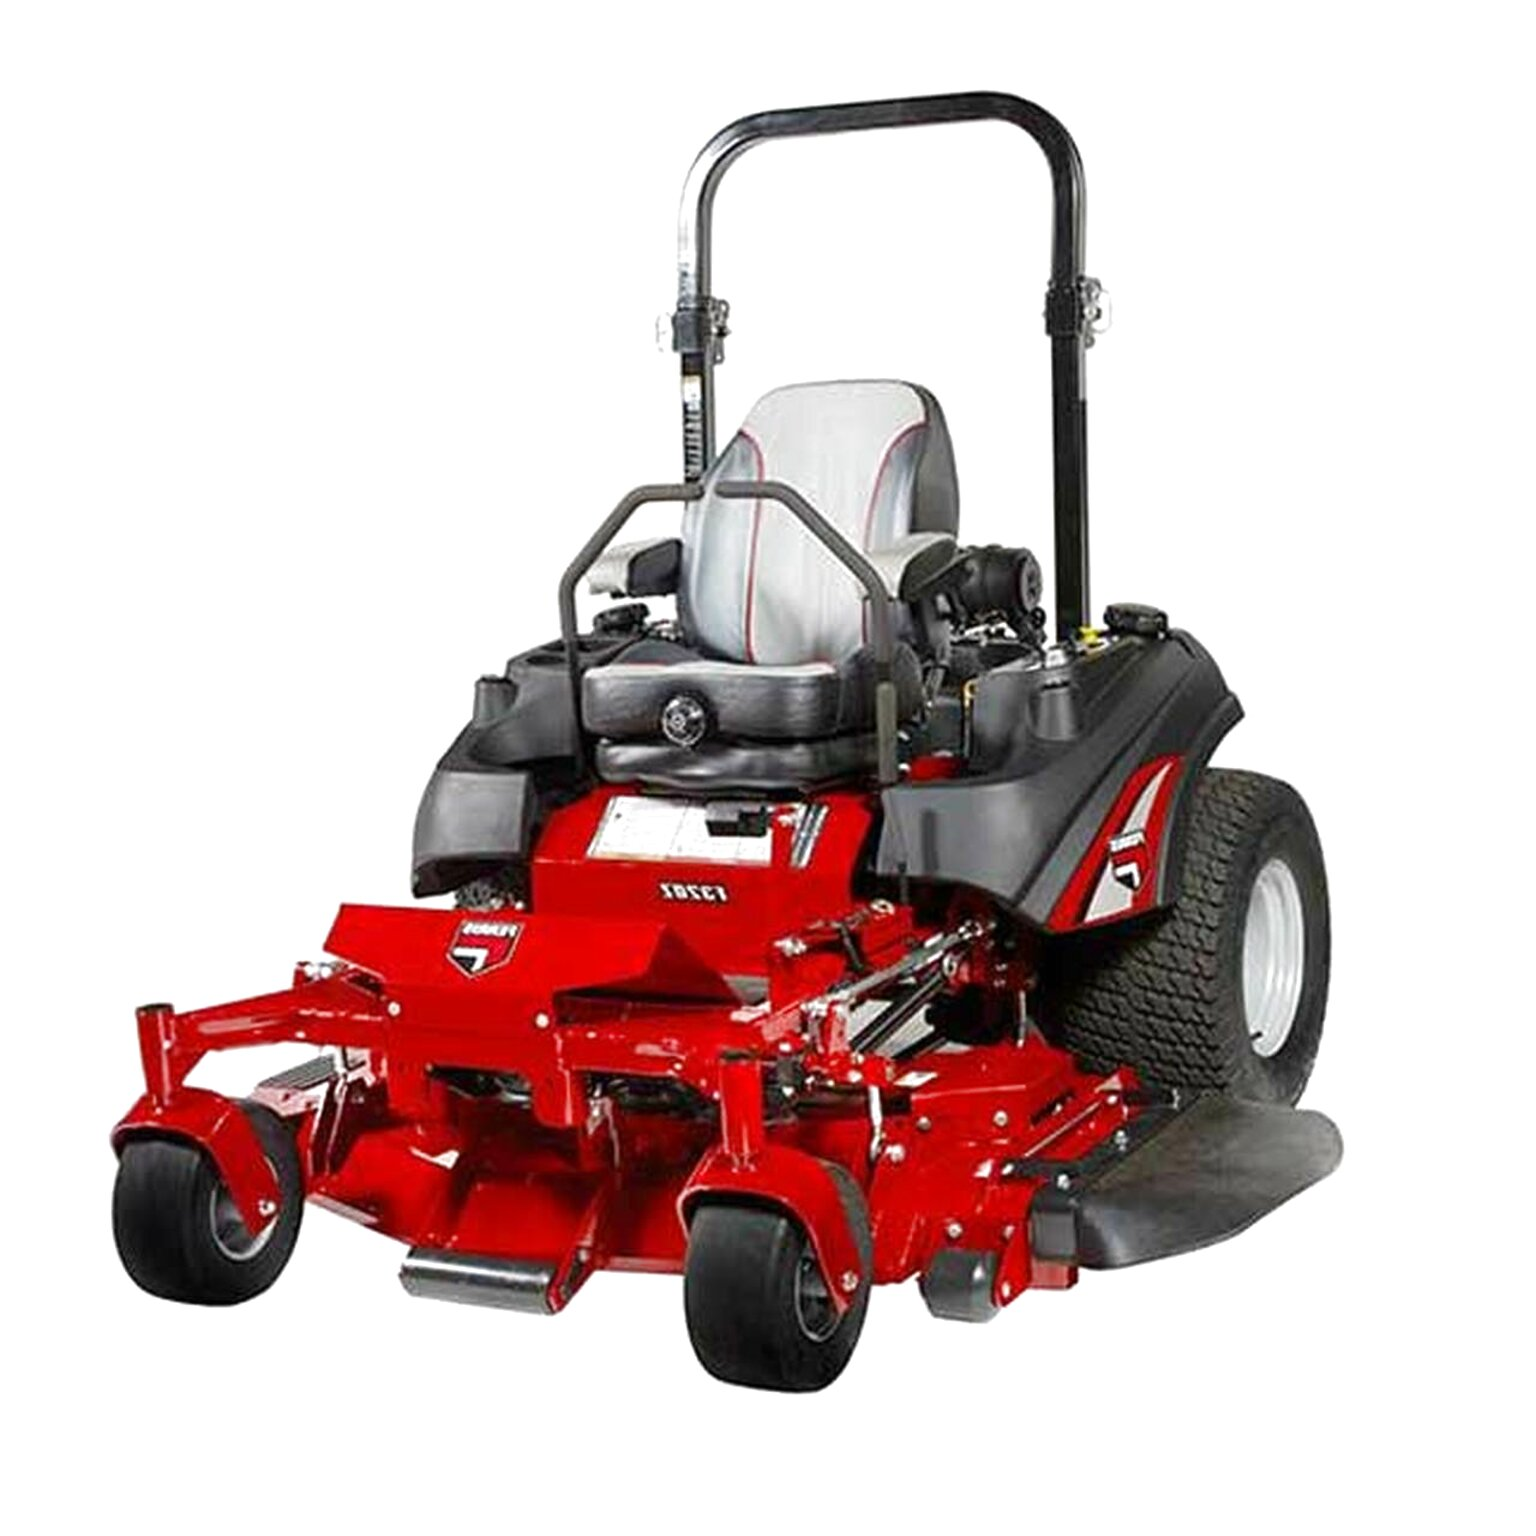 ferris lawn mower for sale